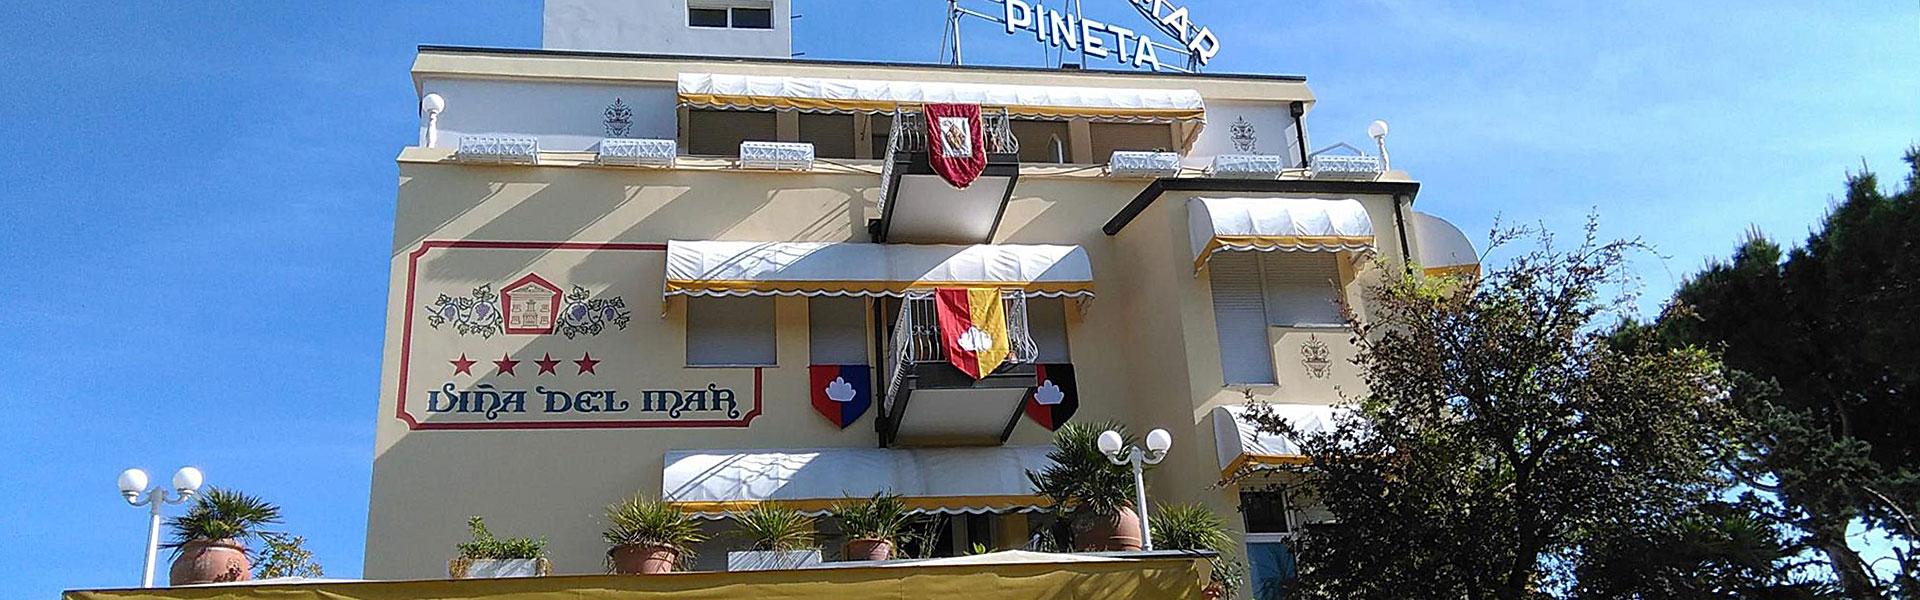 hotel-jesolo-pineta